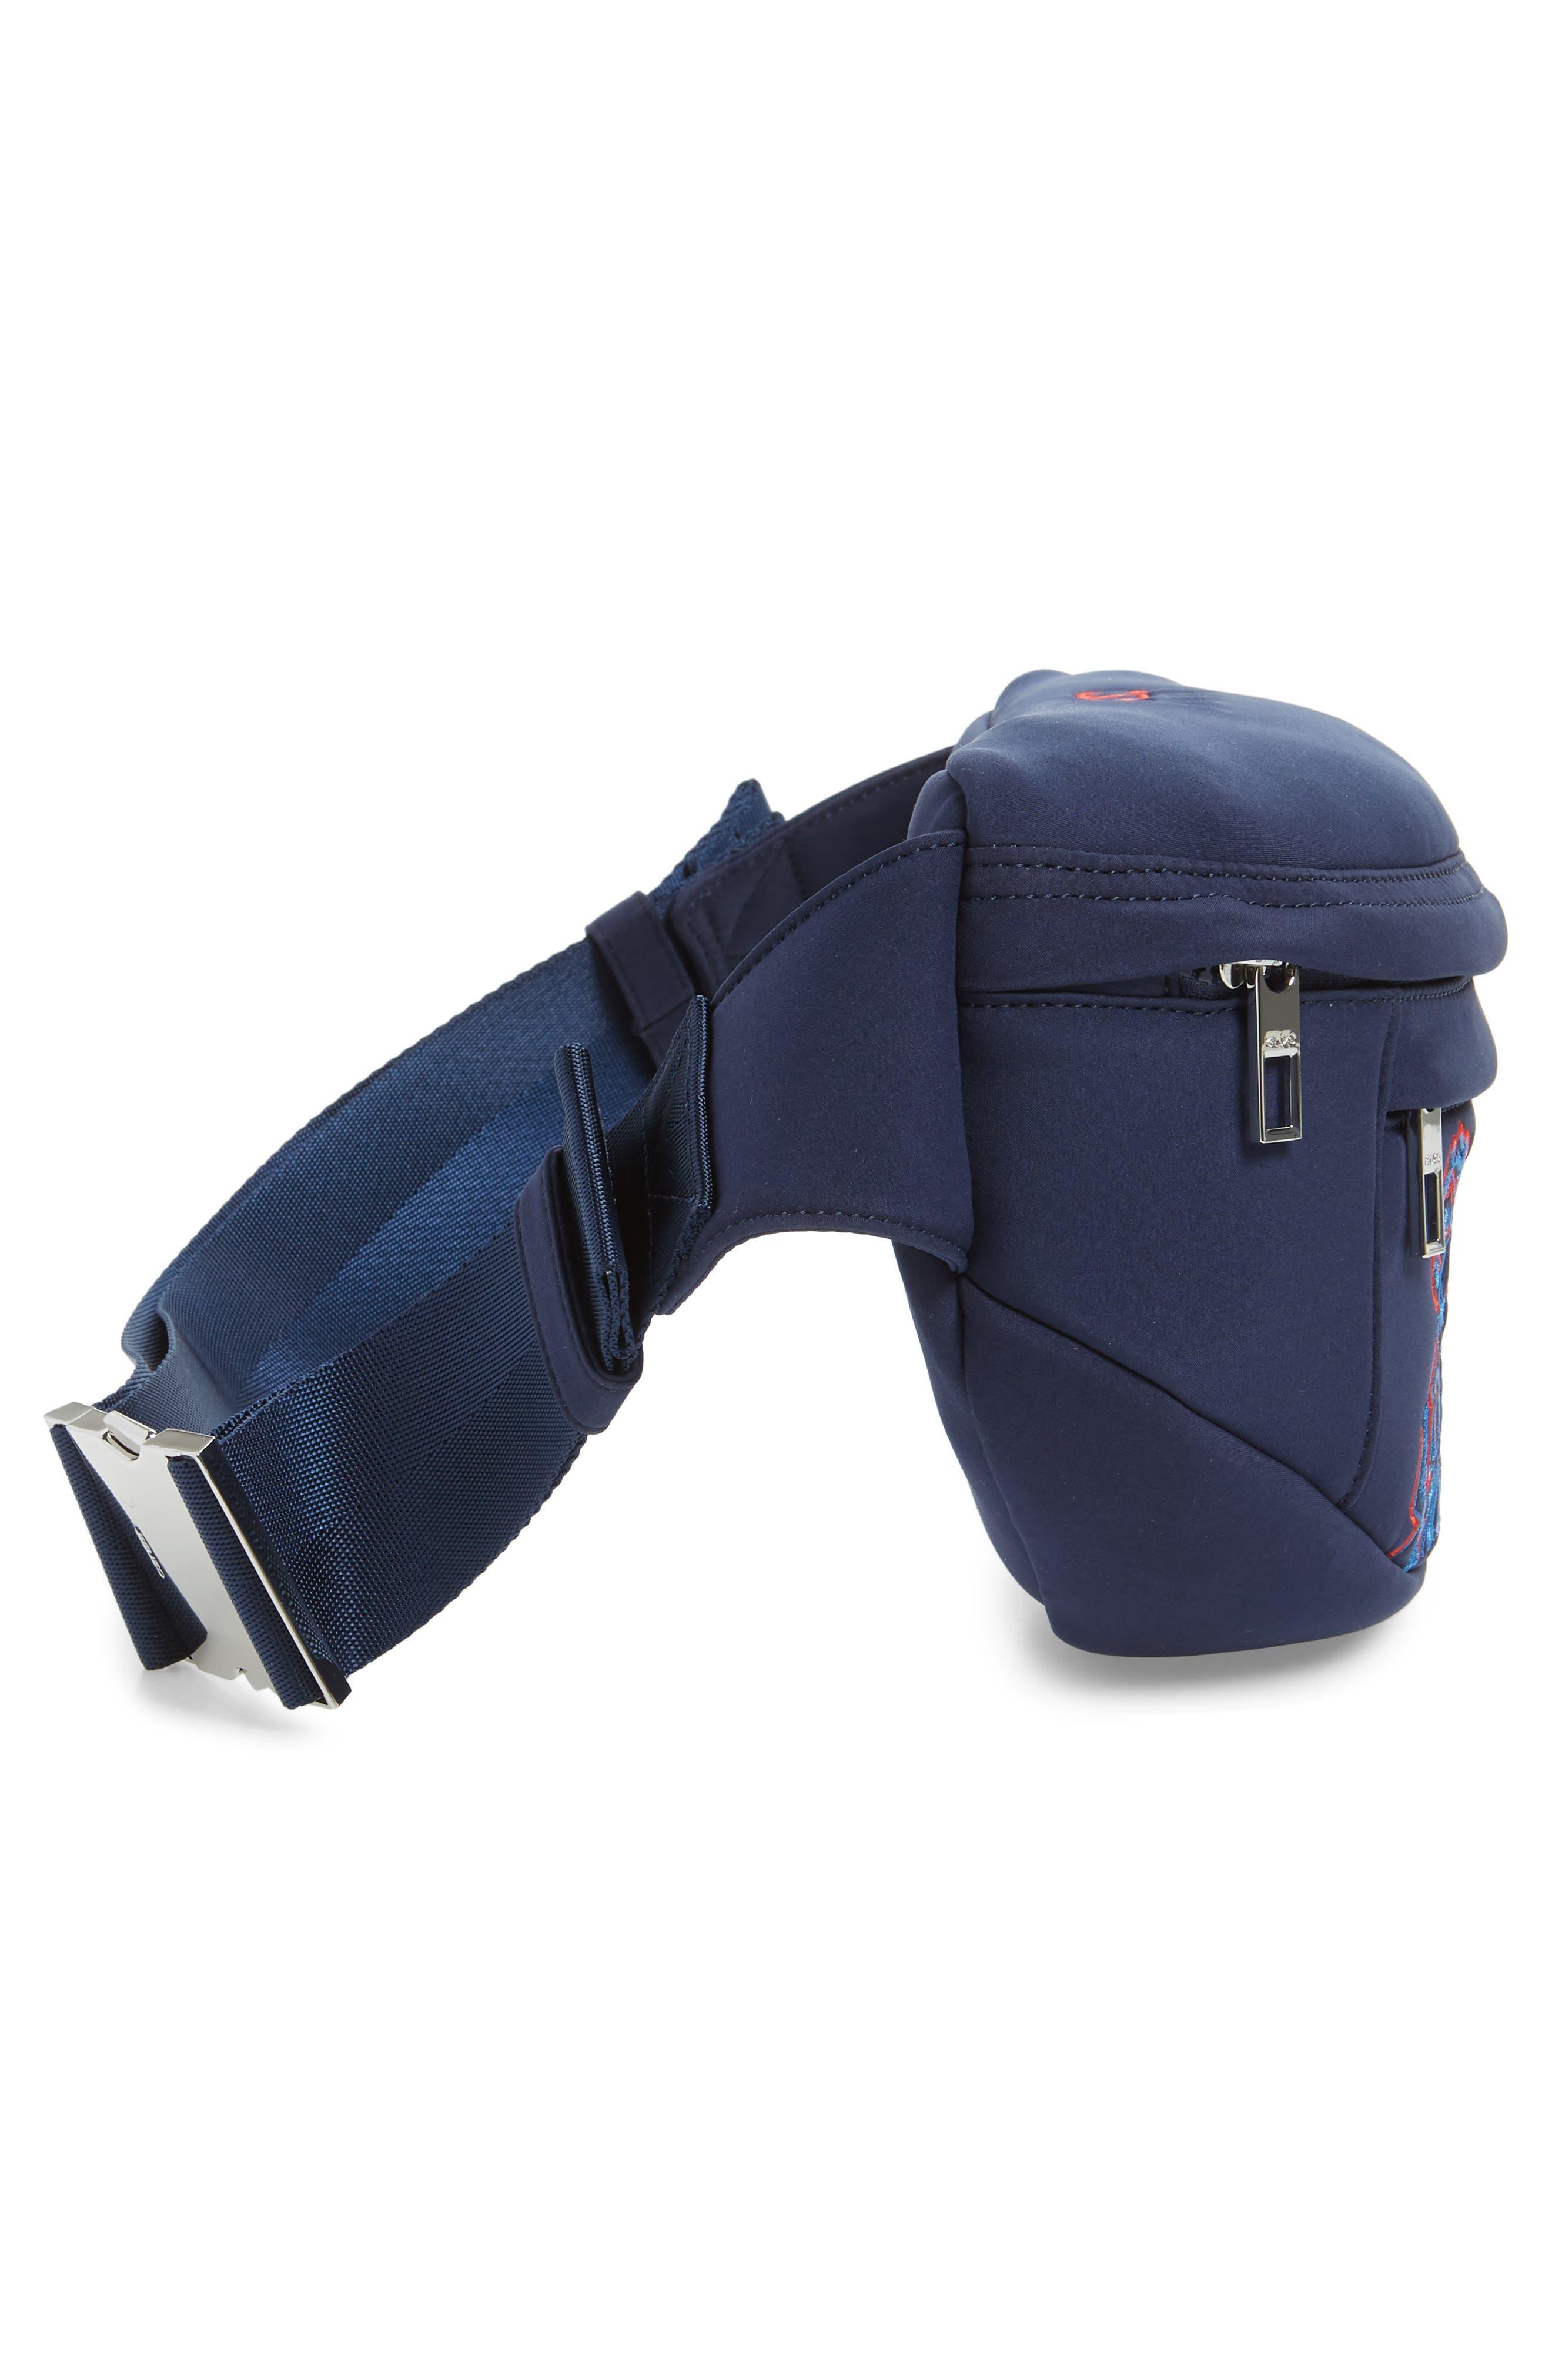 KENZO, Embroidered Tiger Belt Bag, Alternate thumbnail 6, color, 76A NAVY BLUE